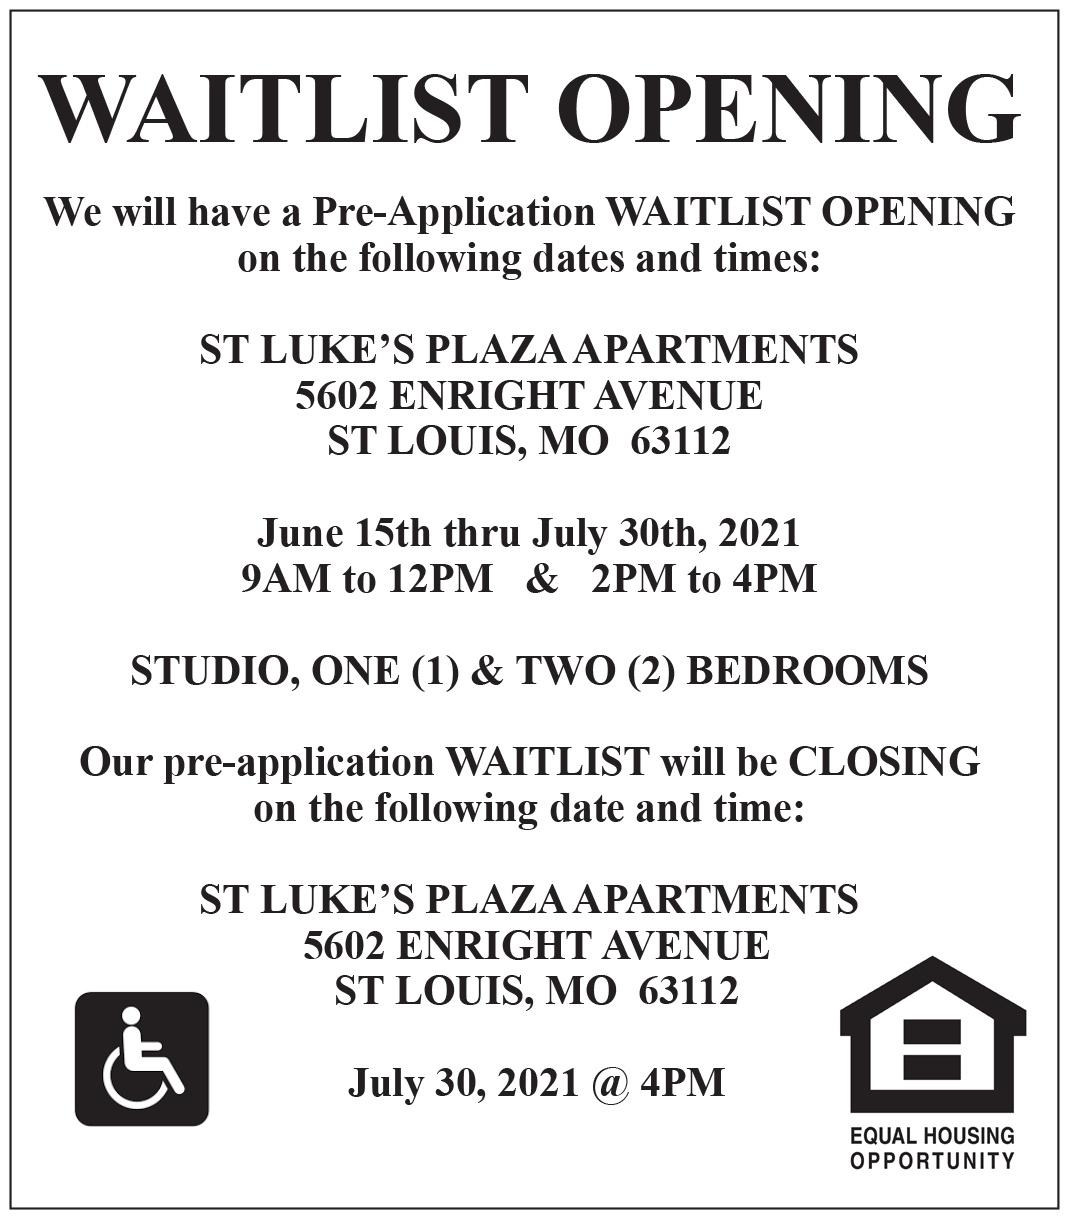 Waitlist Opening